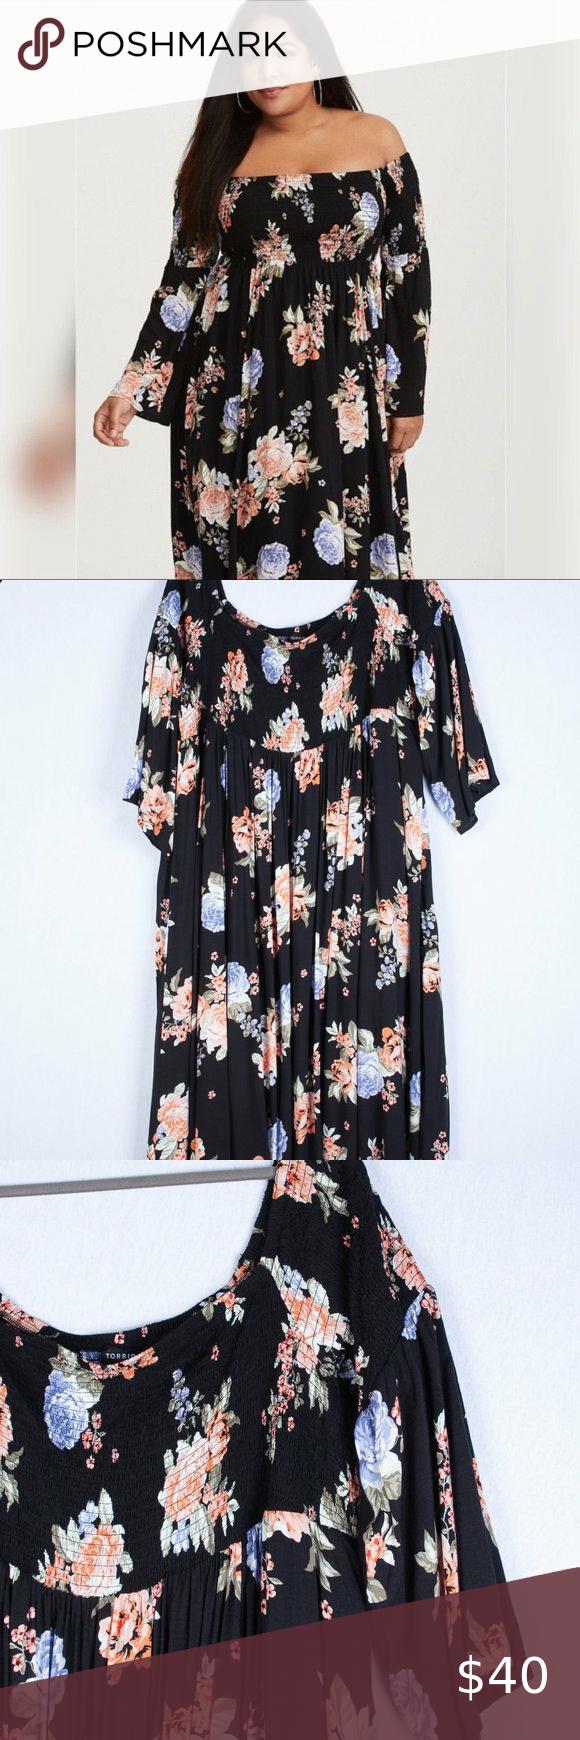 Torrid Floral Smocked Maxi Dress Size 5x Dresses Maxi Dress Womens Maxi Dresses [ 1740 x 580 Pixel ]